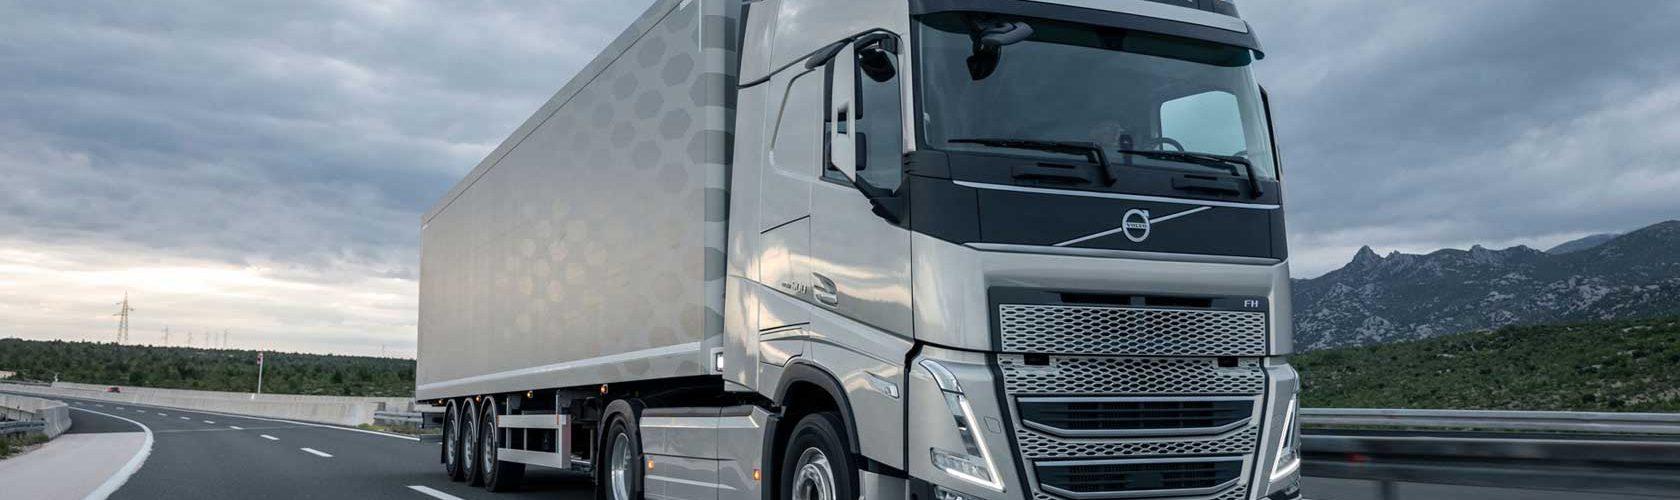 480 New Trucks